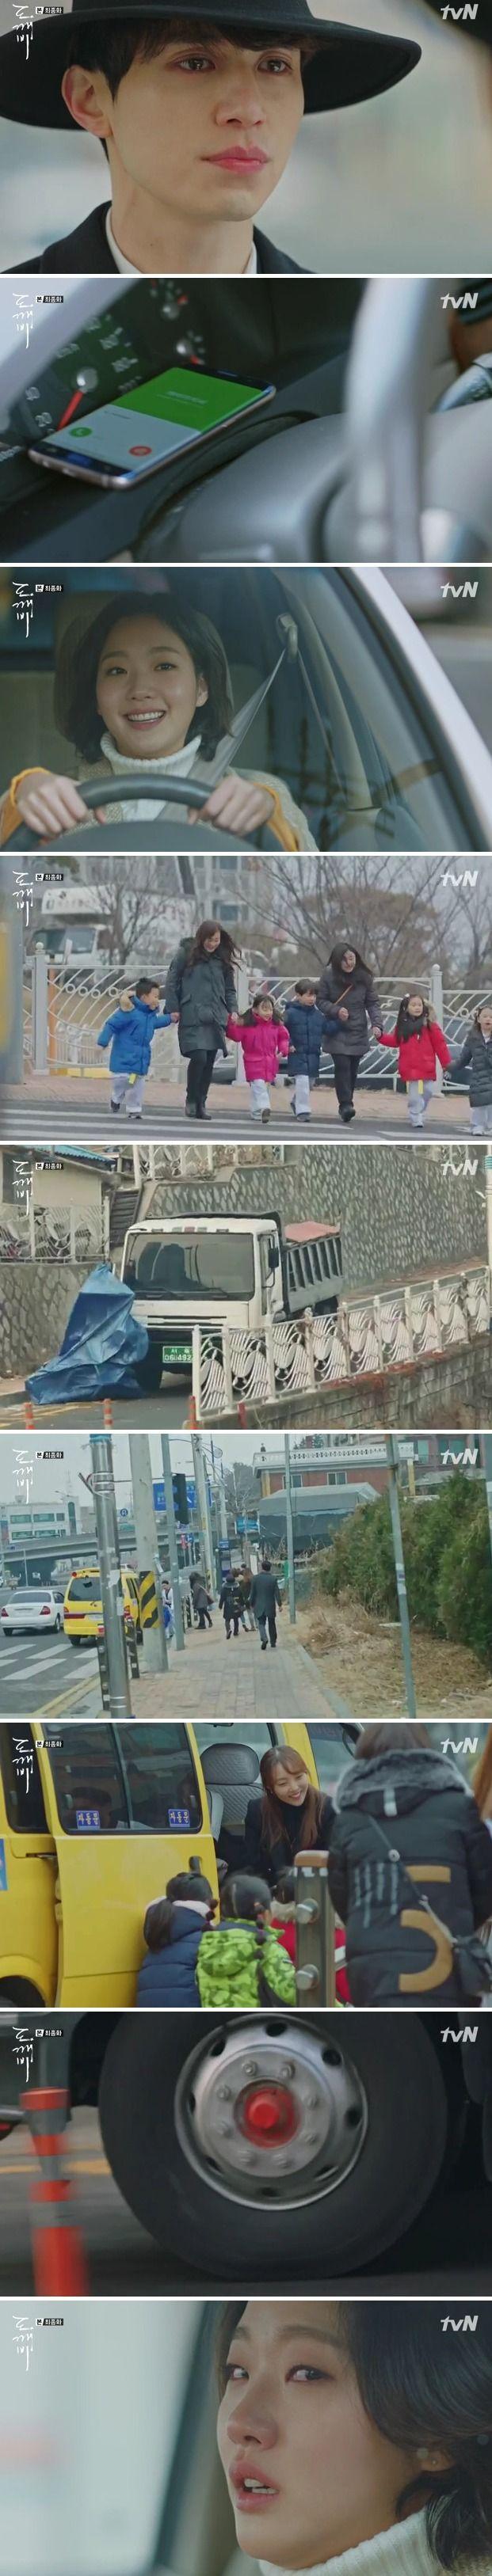 Goblin (쓸쓸하고 찬란하神-도깨비) Korean - Drama - Episode 16 - Picture